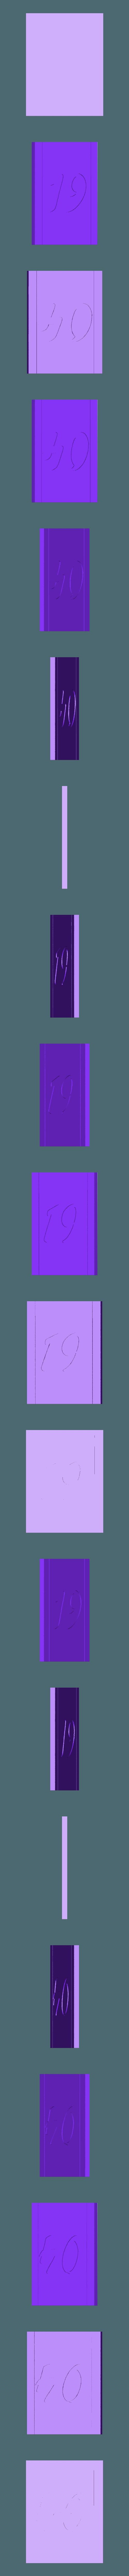 19_-_4.stl Download free SCAD file Perpetual Flip Calendar (W/ Customizable Font) • 3D printable model, Dsk